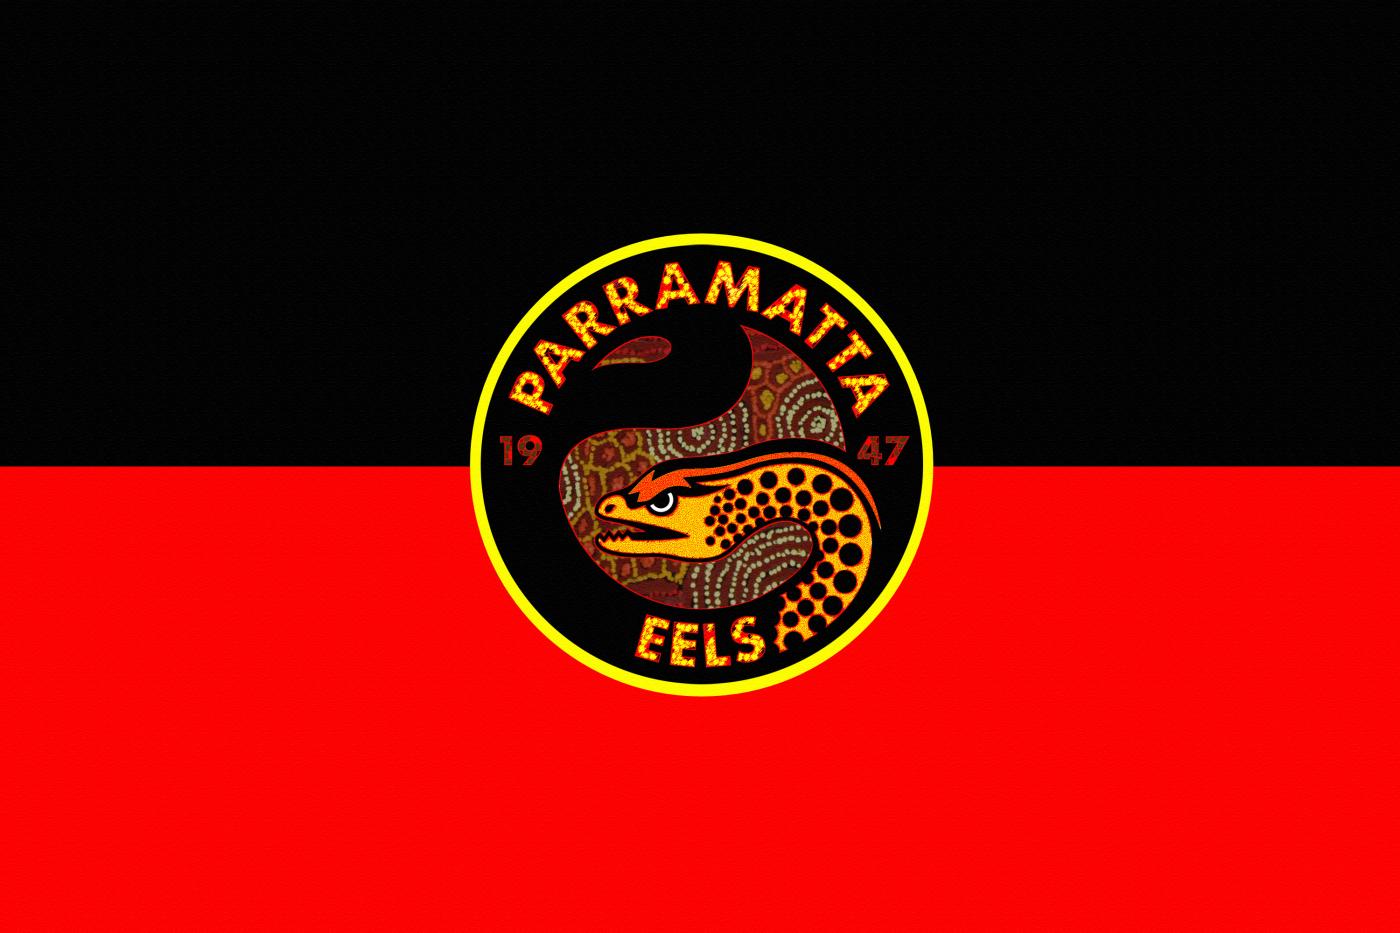 Parramatta Eels Aboriginal Flag Wallpaper by Sunnyboiiii 1400x933